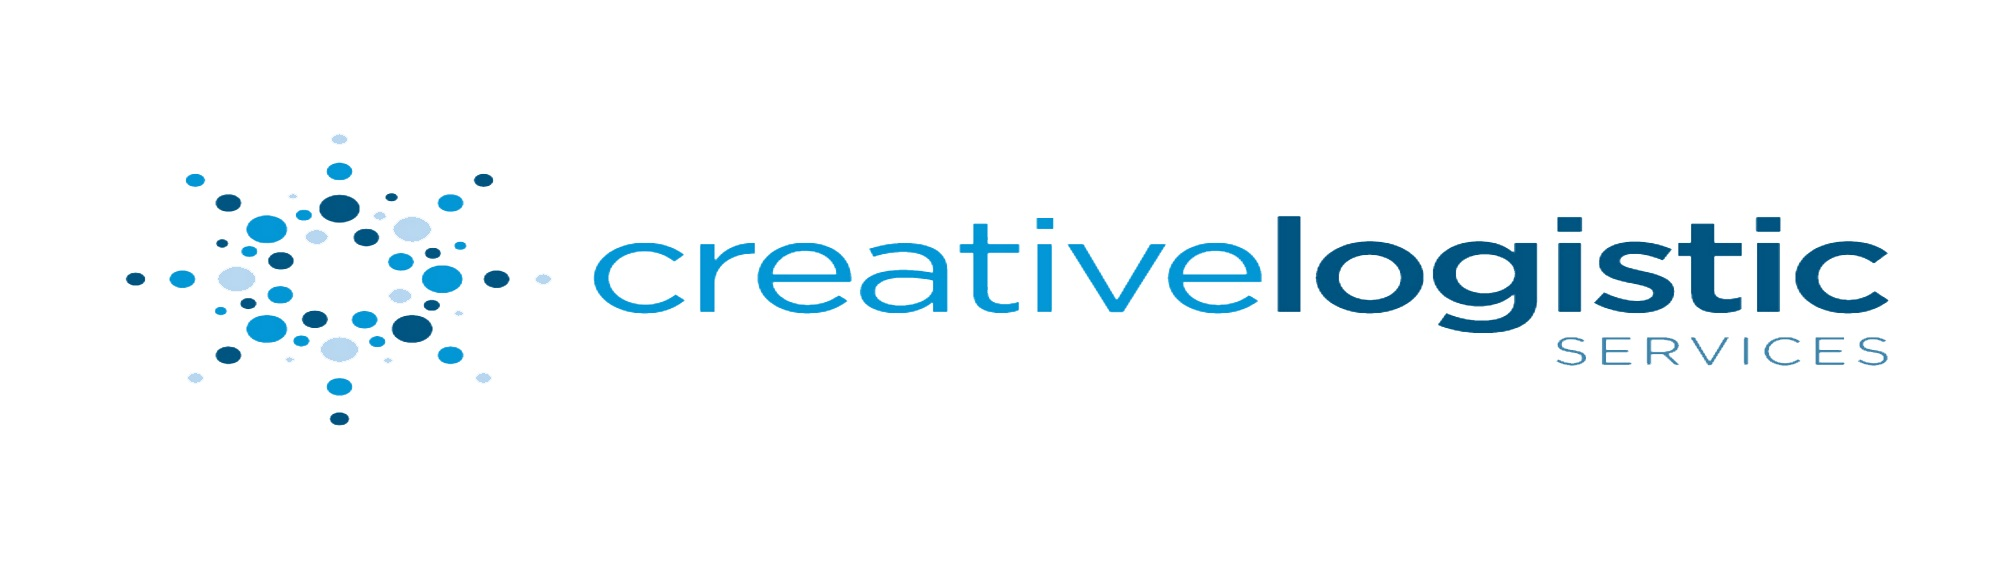 Creative Logistic (Original) (FIX-FINAL) - (JPG) -Format (Original).jpg